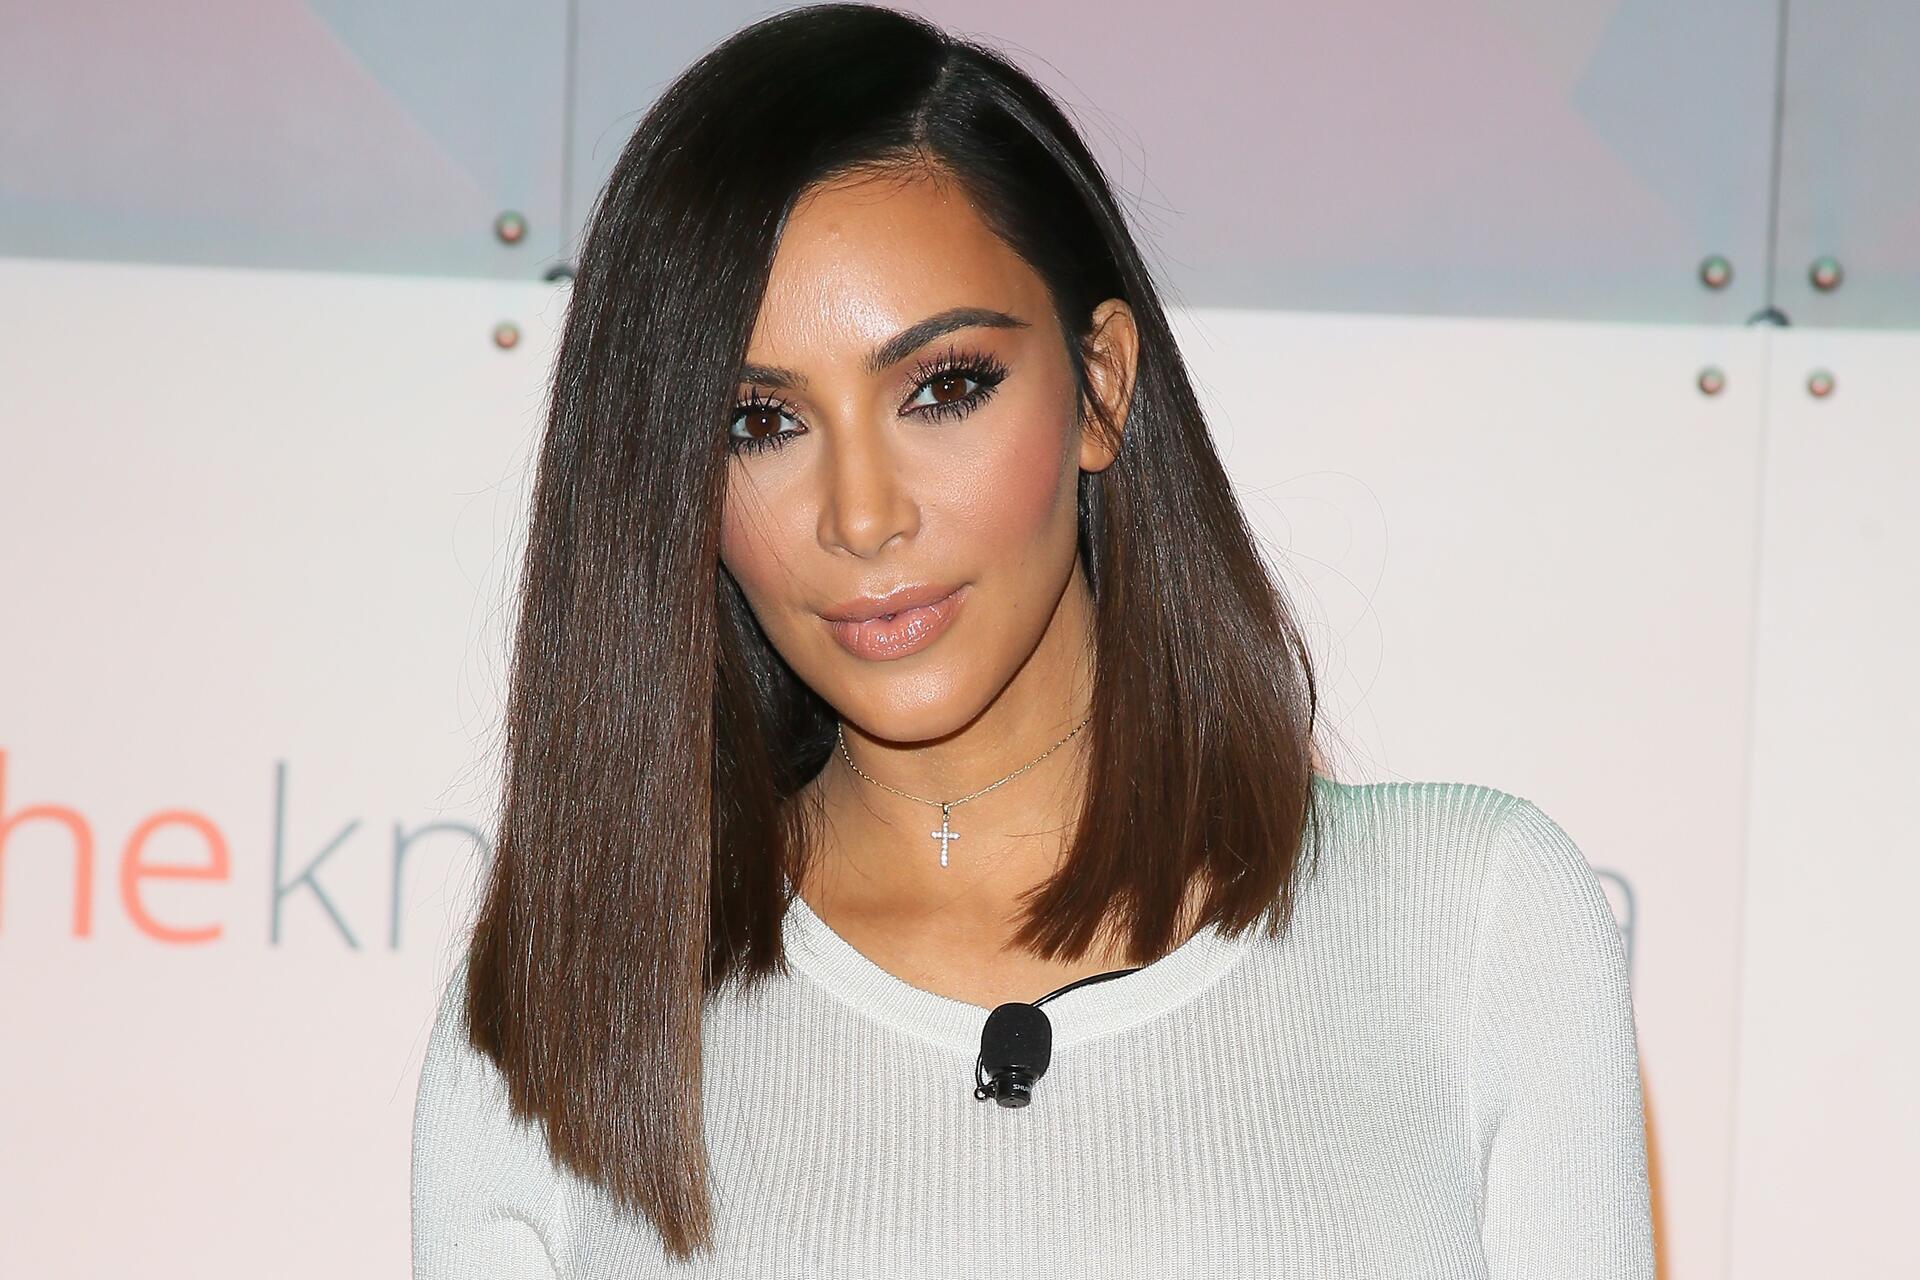 Bild zu Kim Kardashian, Geld